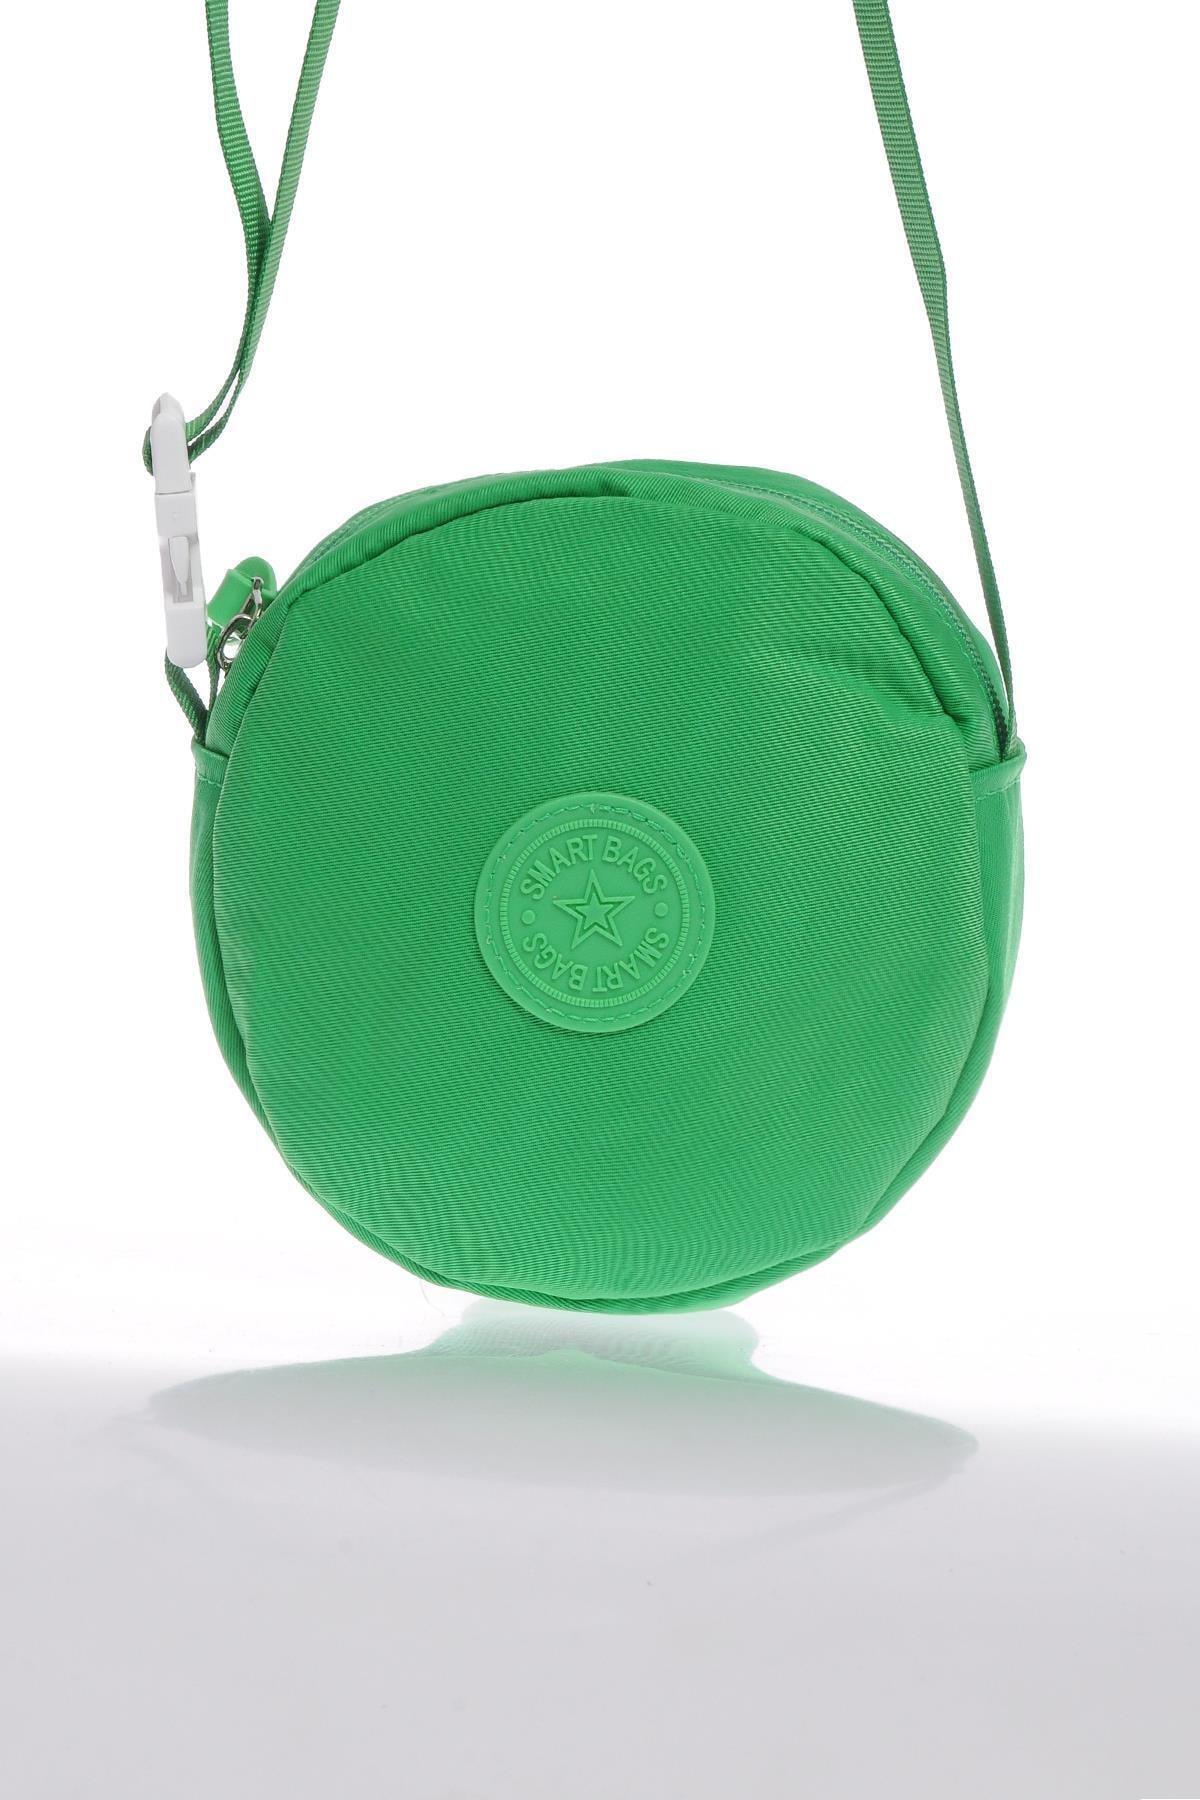 SMART BAGS Smb6001-0069 Yeşil Kadın Minik Çapraz Çanta 1